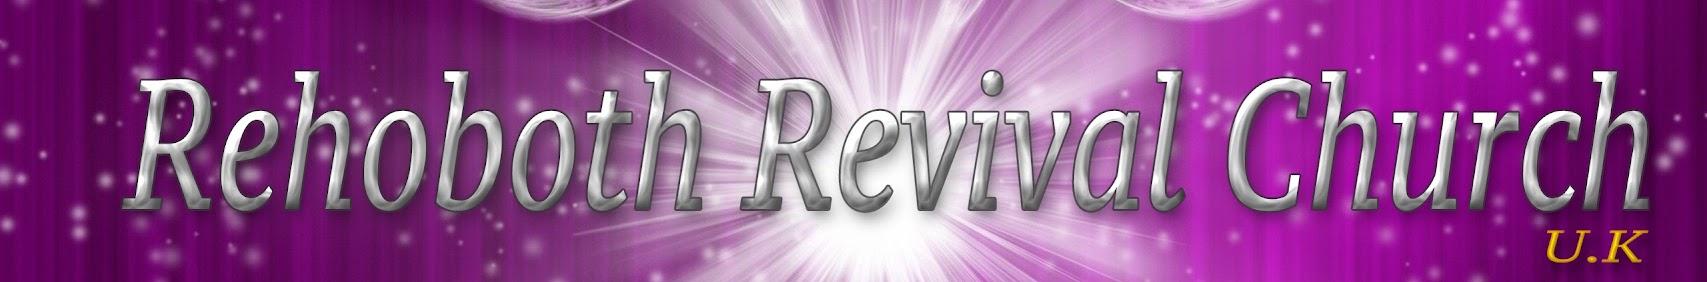 Rehoboth Revival ဘုရားကျောင်းတမီး U.K